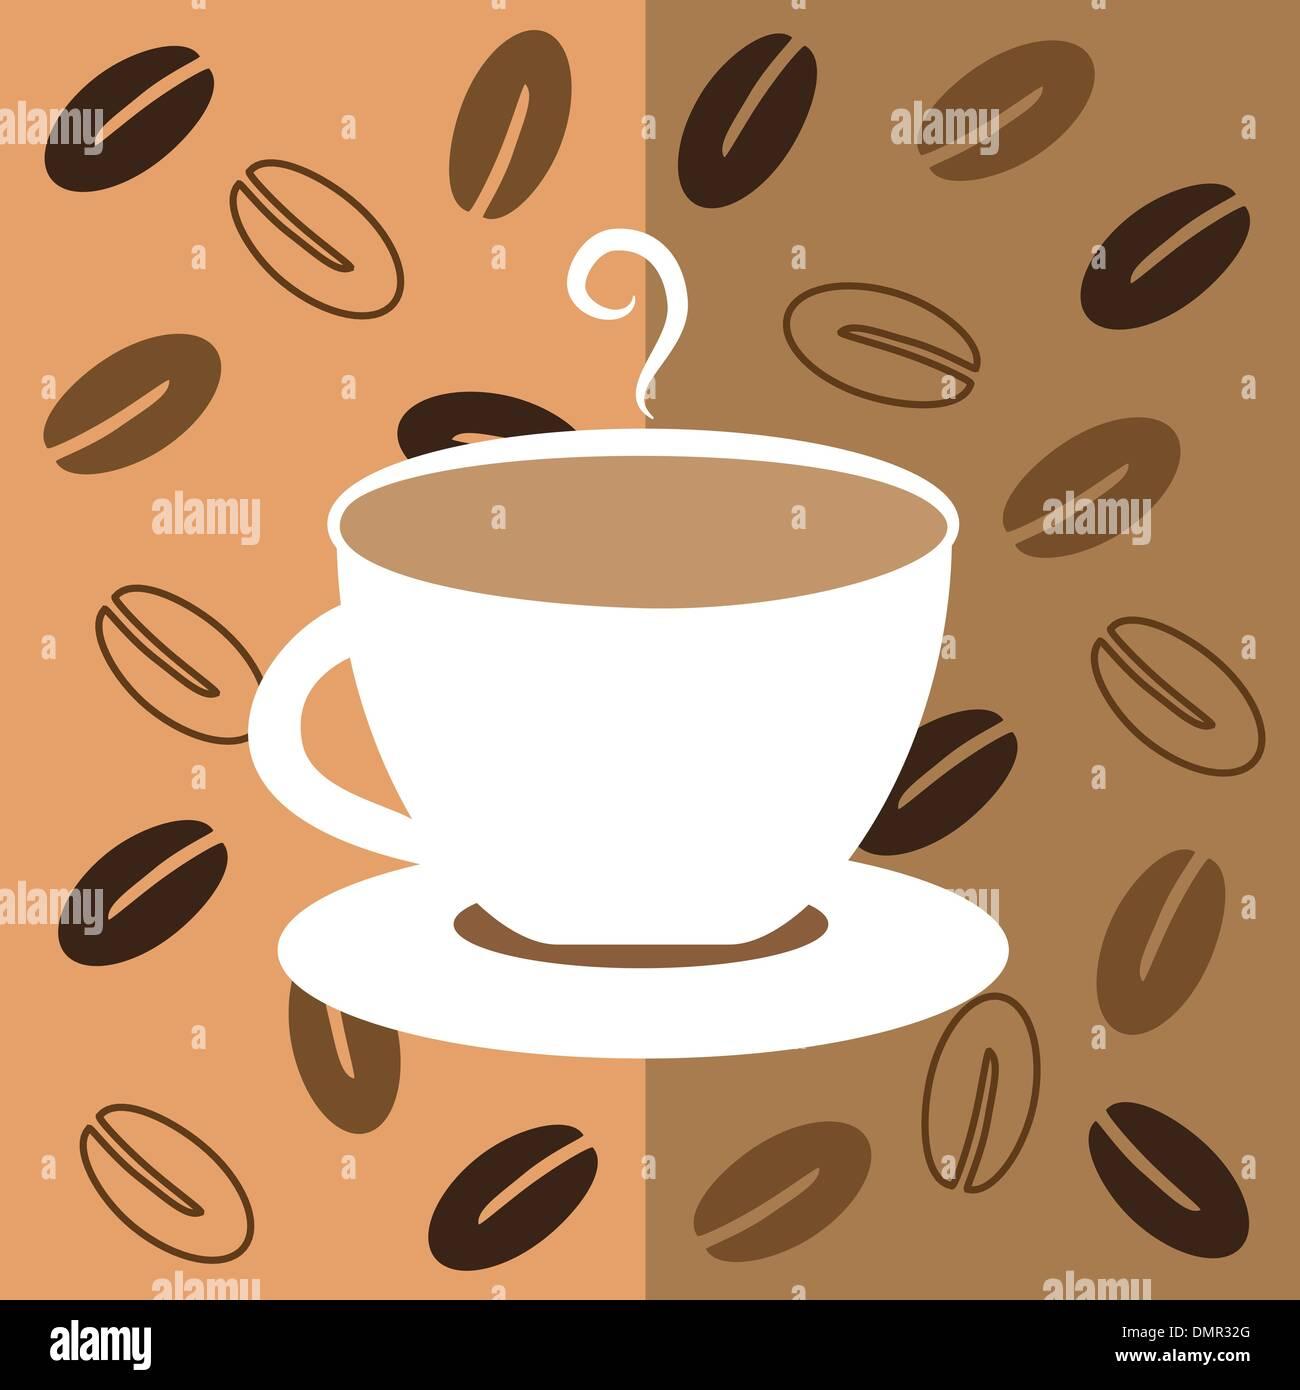 ae2573dd899 Coffee Bean Swirls Stock Photos & Coffee Bean Swirls Stock Images ...